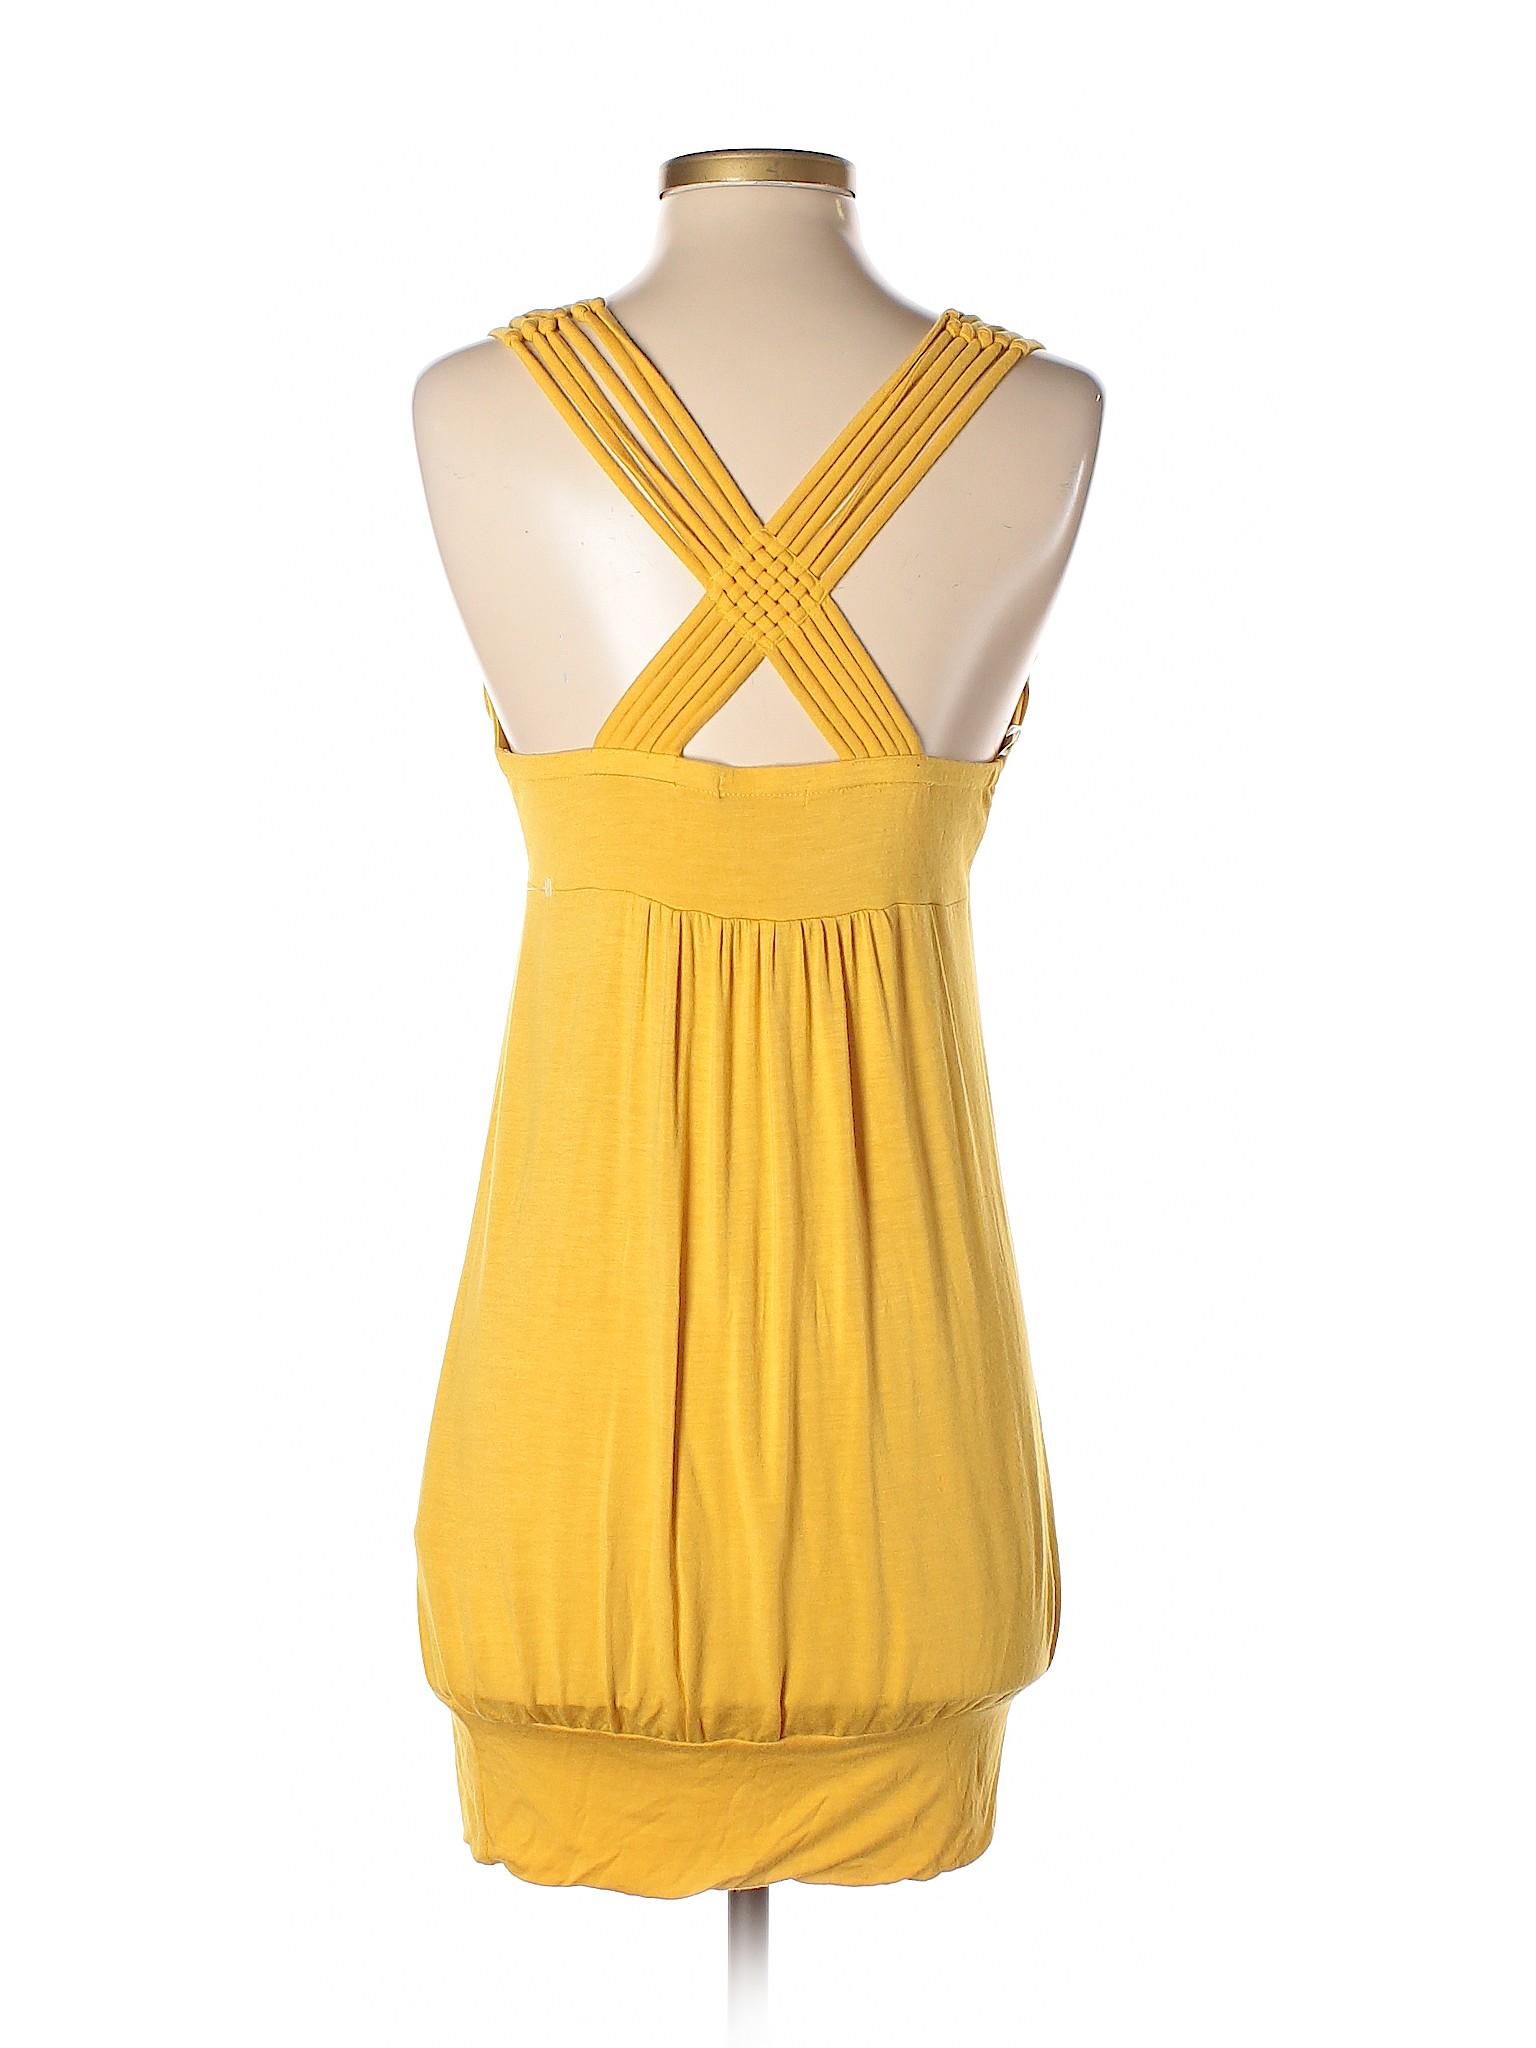 XXI Selling Dress Selling Casual XXI fEq0w0